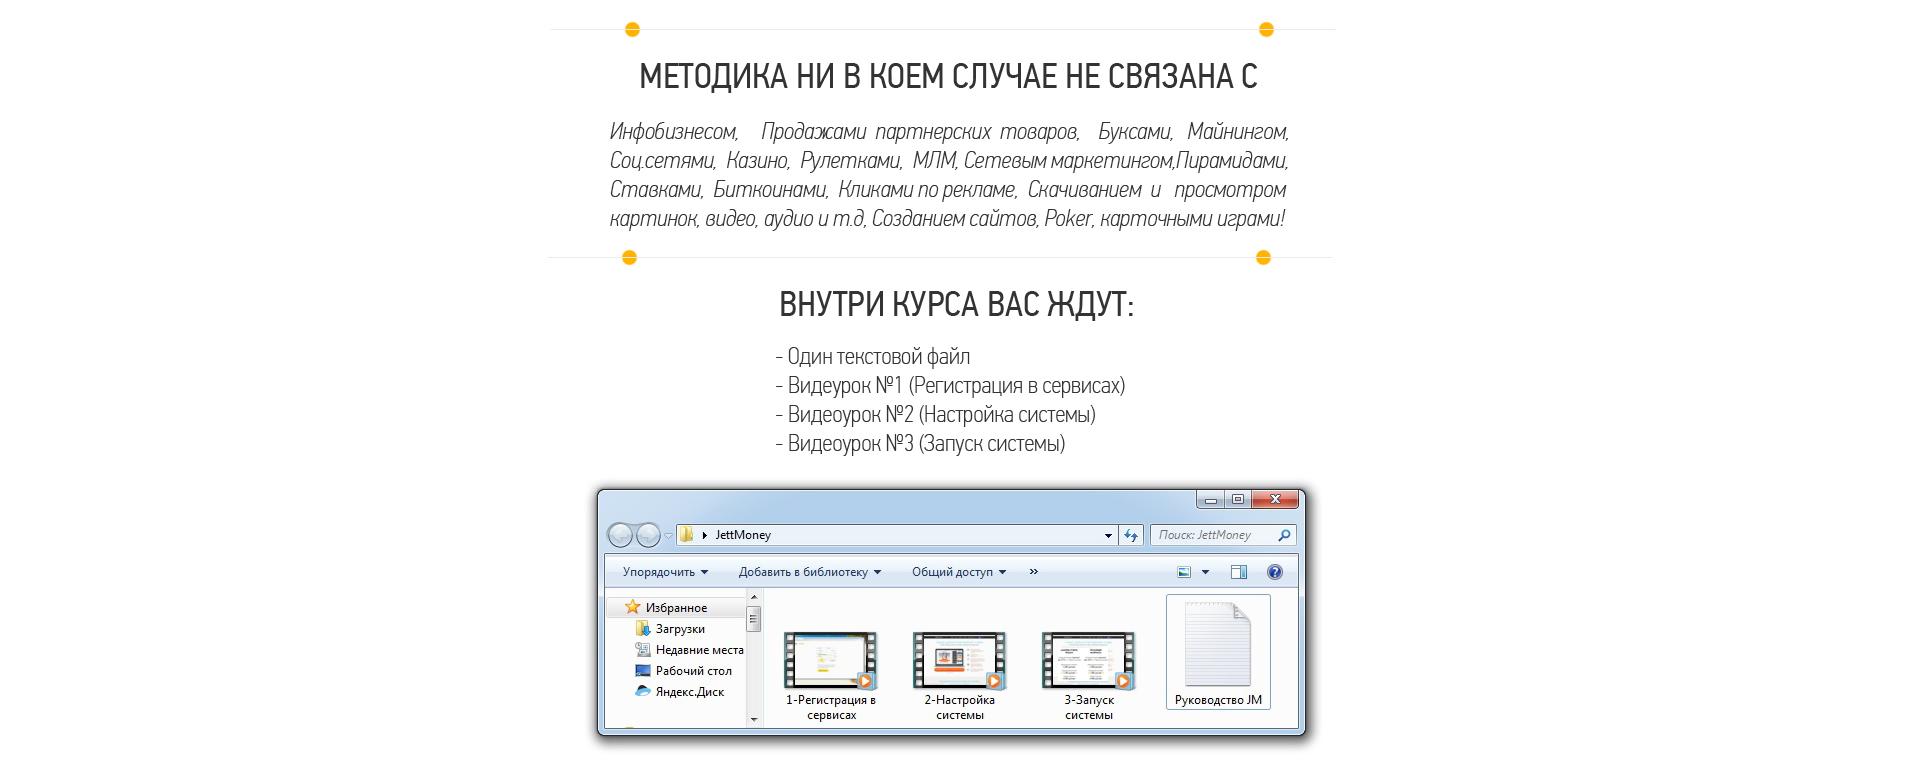 http://media.lpgenerator.ru/images/61583/45.jpg#size_1920x776